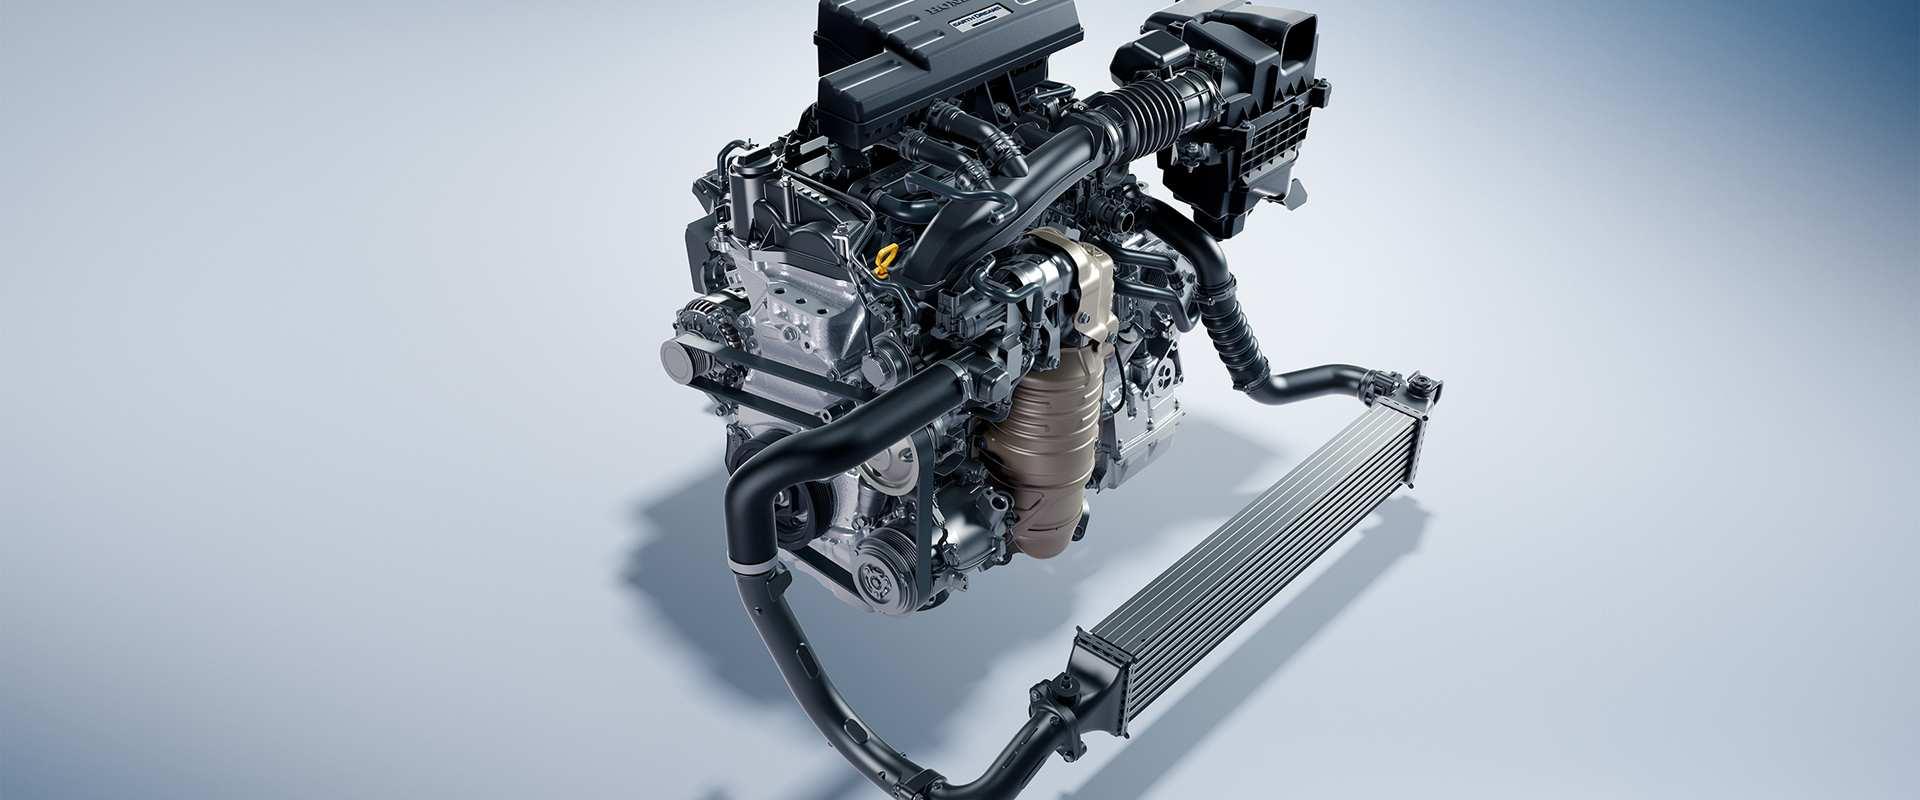 Motor 1.5l TURBO 190cv DOHC 16V duplo VTC